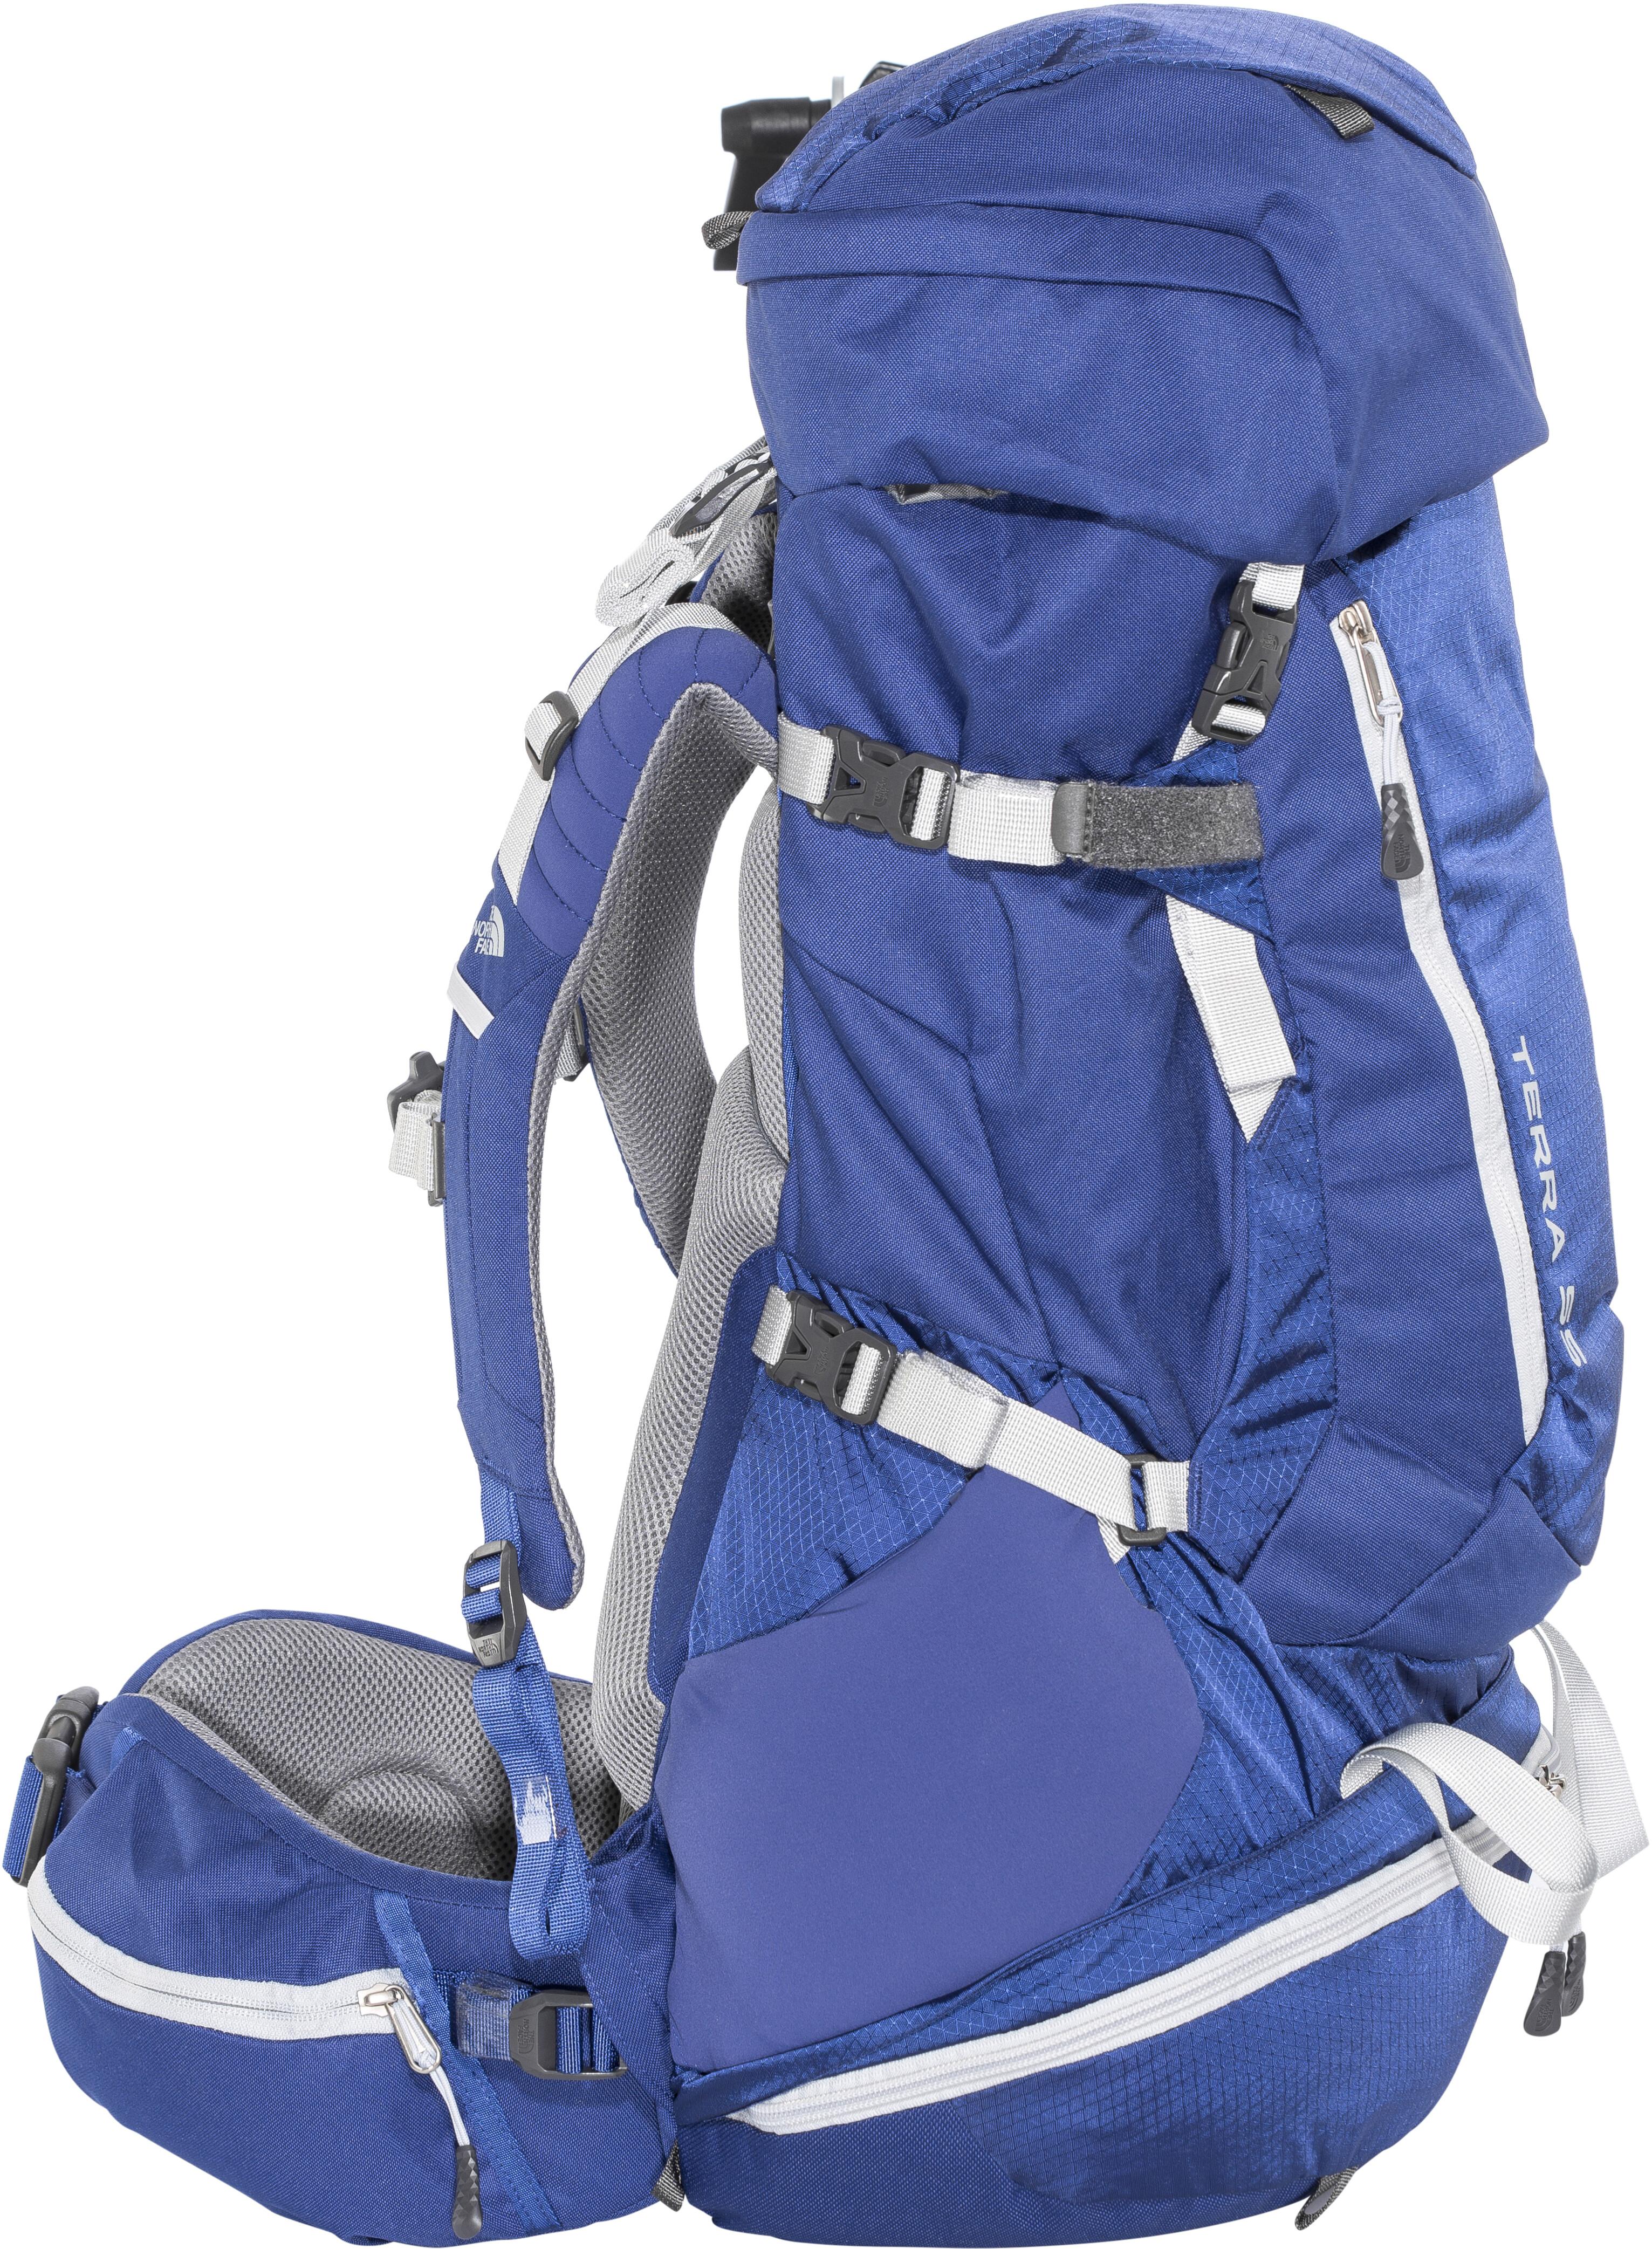 1fd4e1ecc The North Face Terra 55 Backpack Women sodalite blue/high rise grey